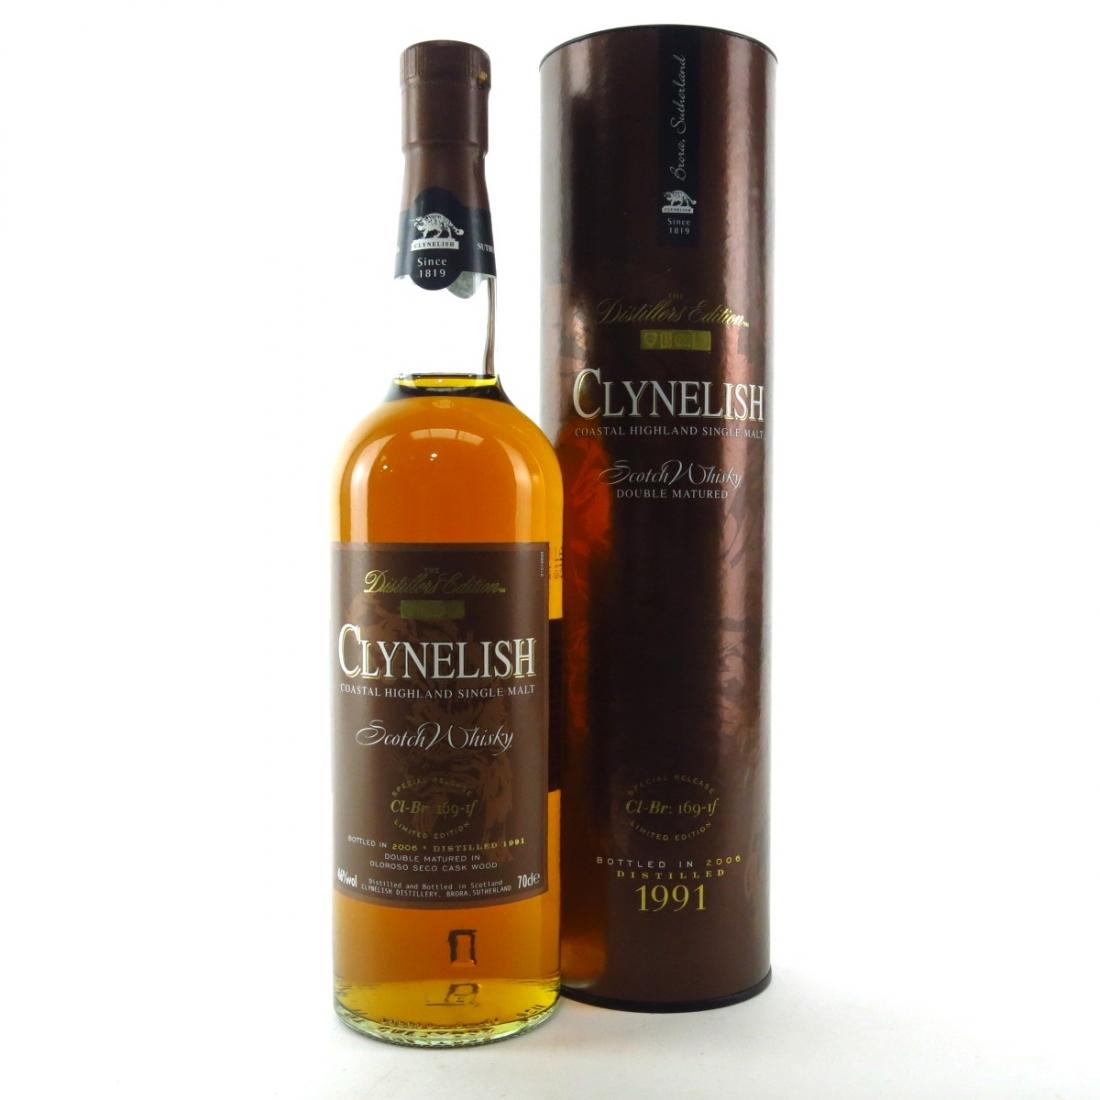 Clynelish 1991 Distillers Edition 2006